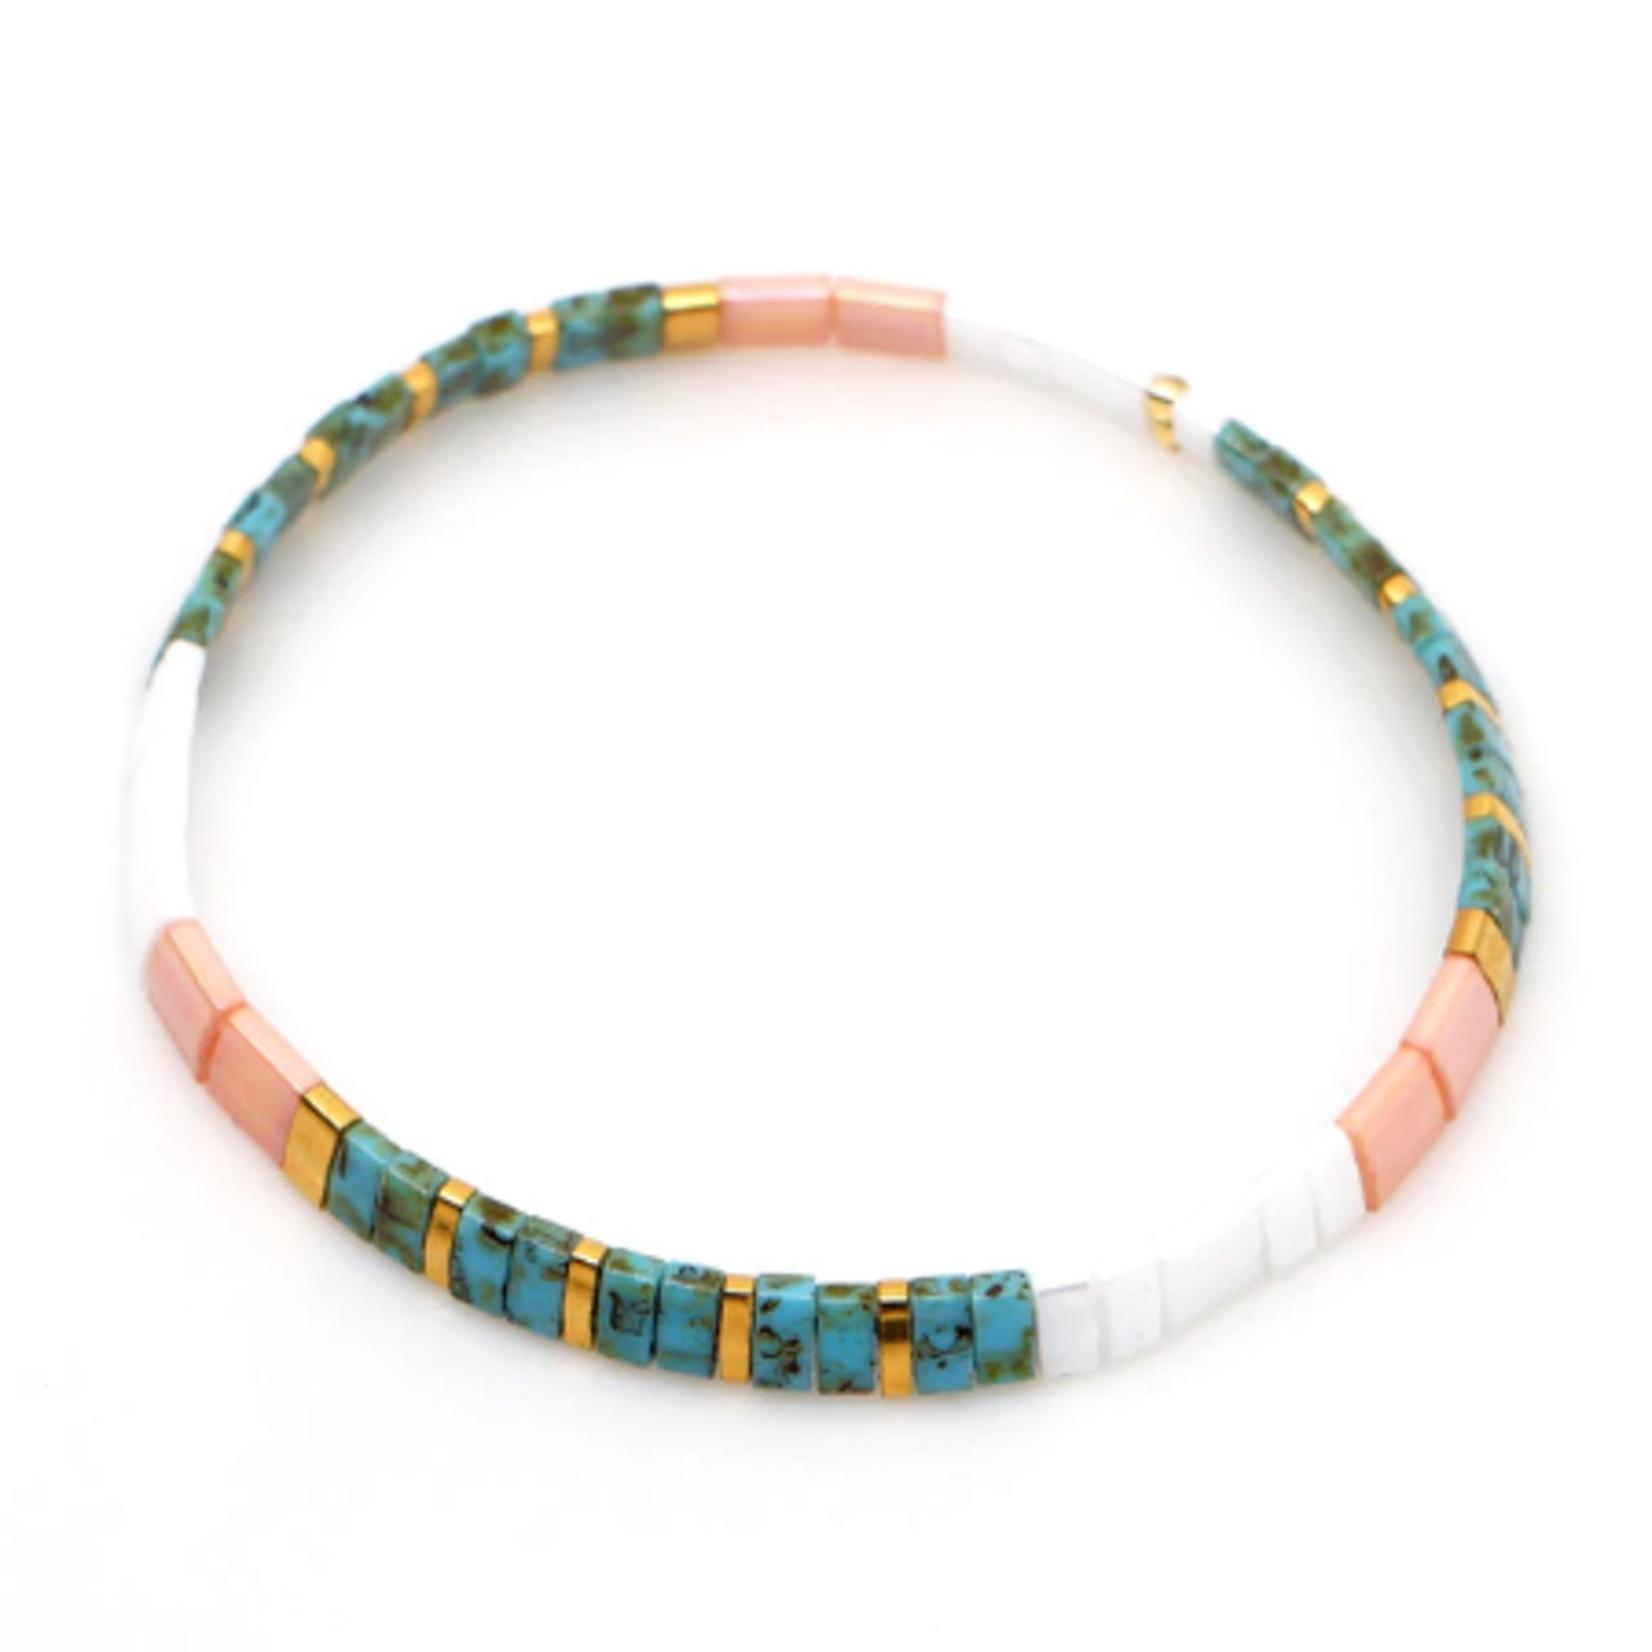 Wyld Blue Lego Bracelet